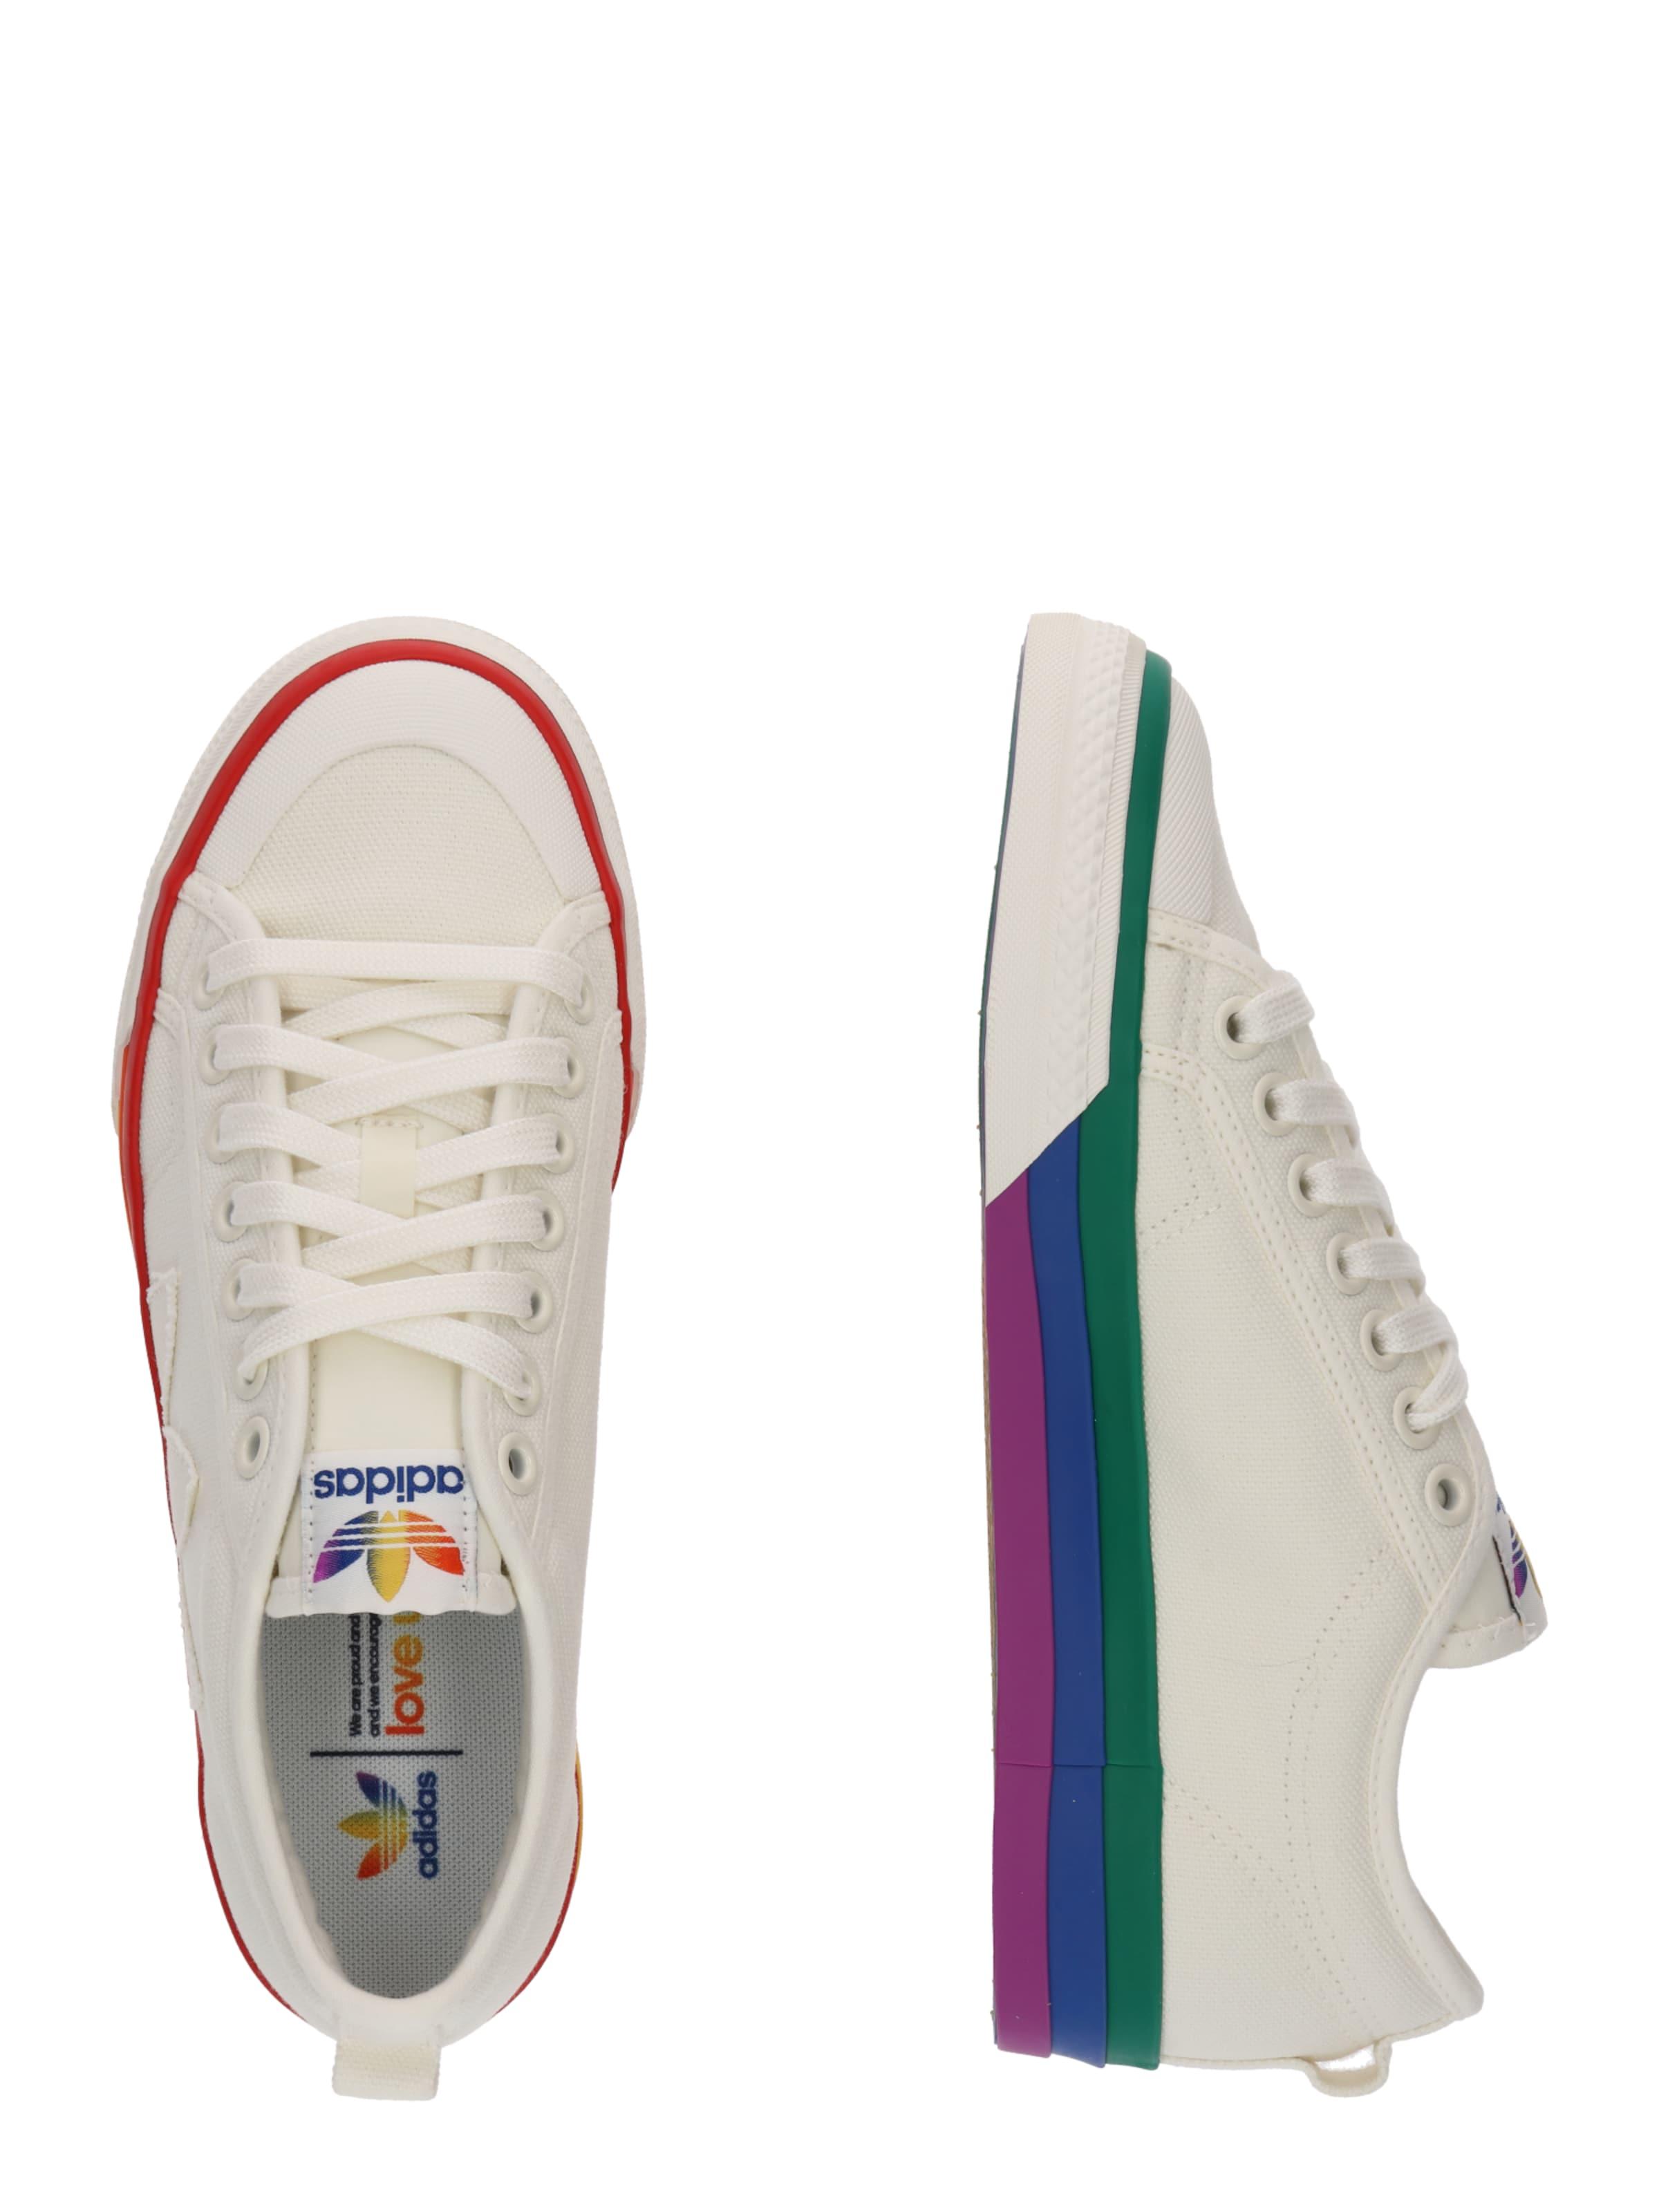 'nizza MischfarbenOffwhite Sneaker In Originals Pride' Adidas 8nkXPwO0